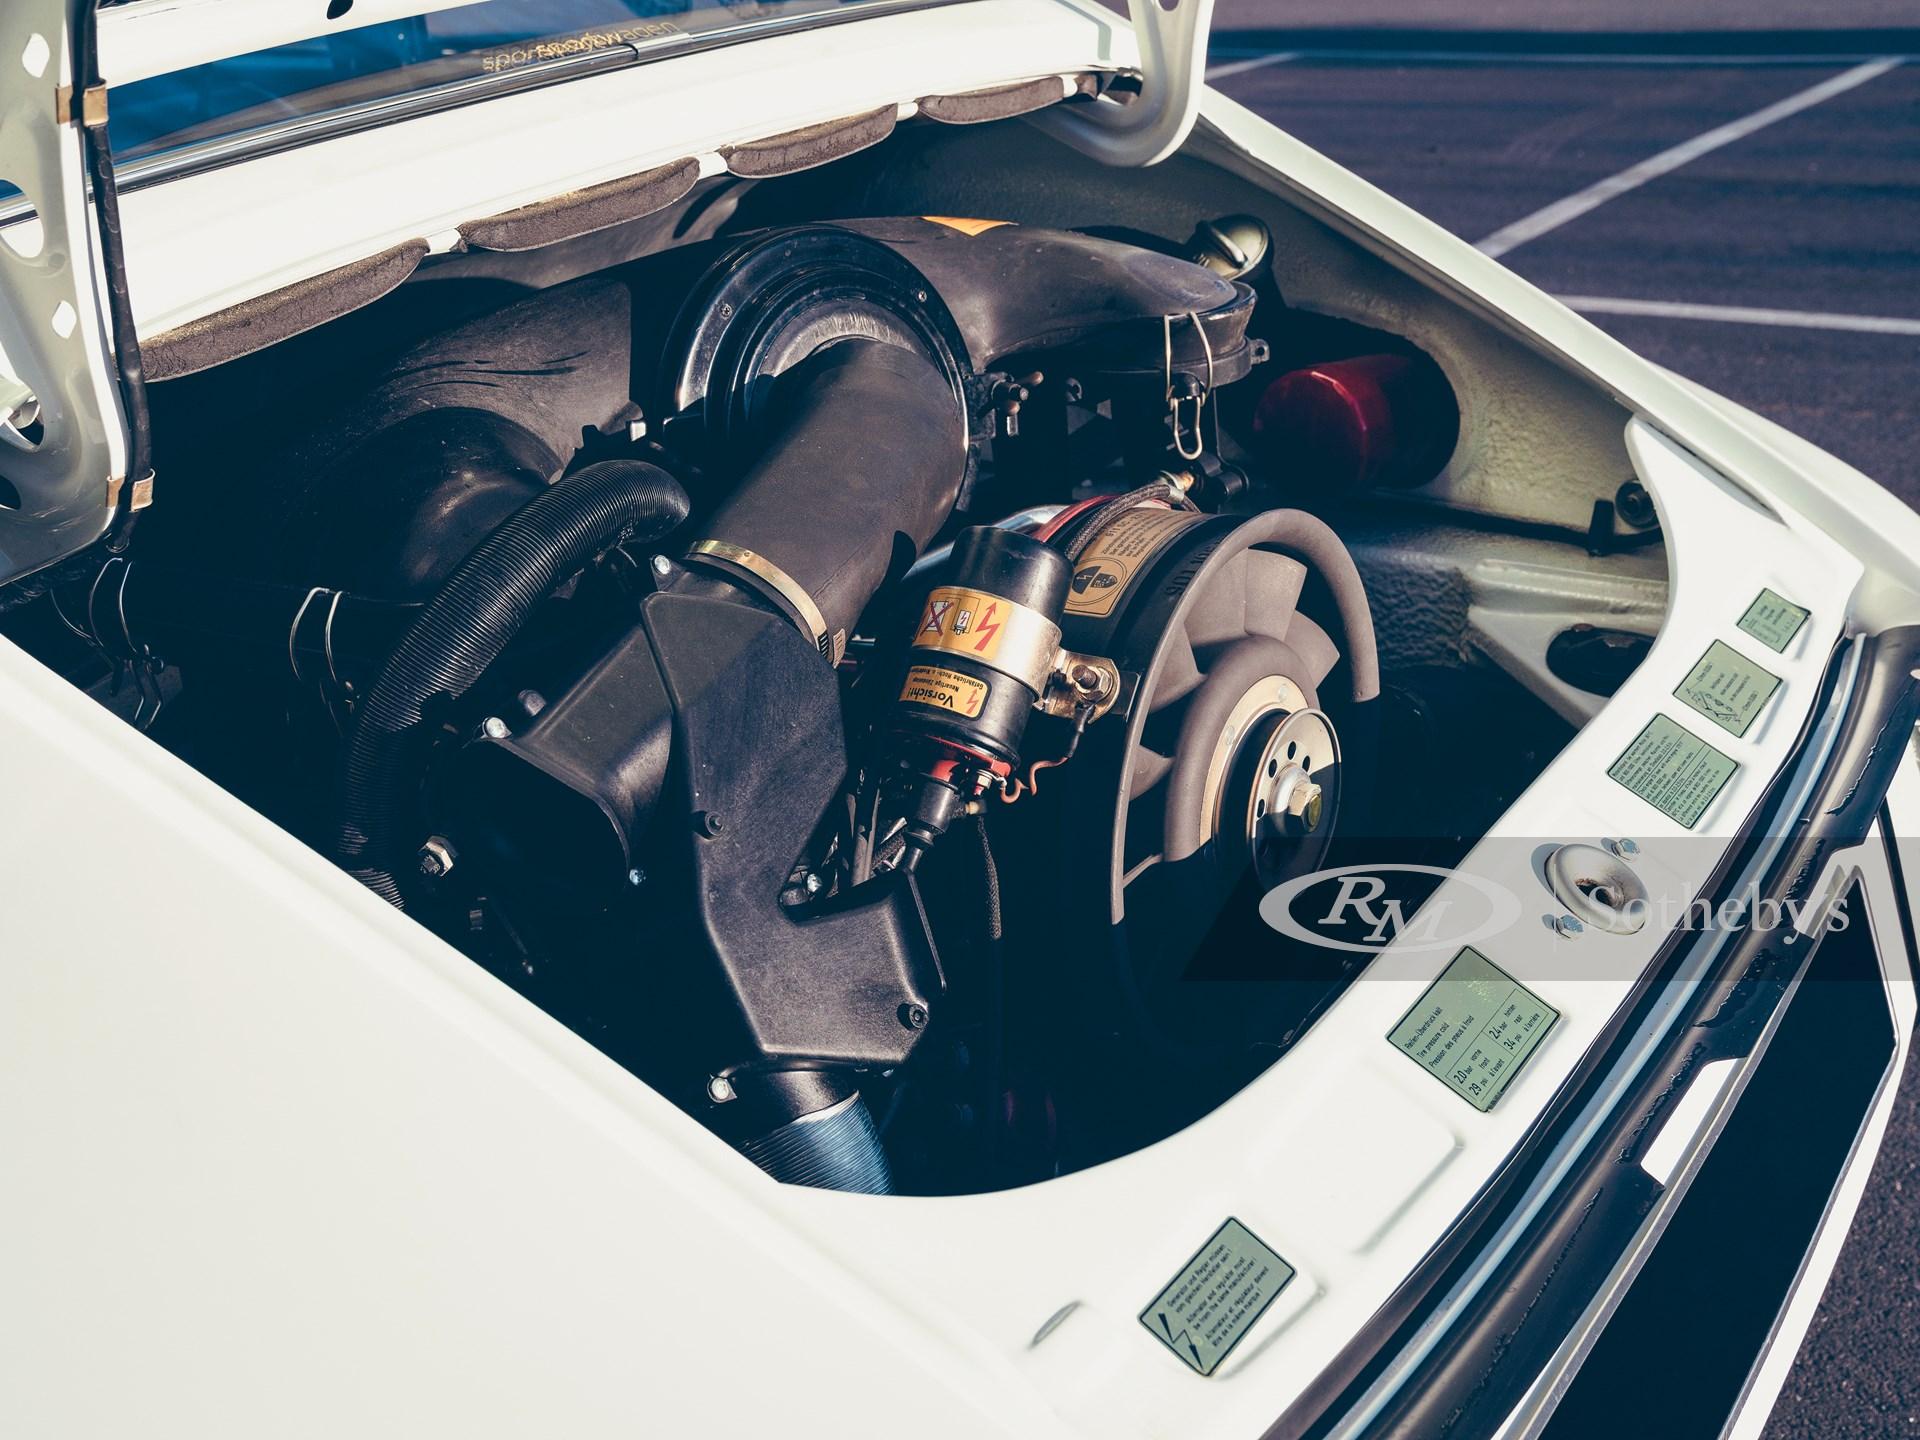 1973 Porsche 911 Carrera RS 2.7 Touring  -